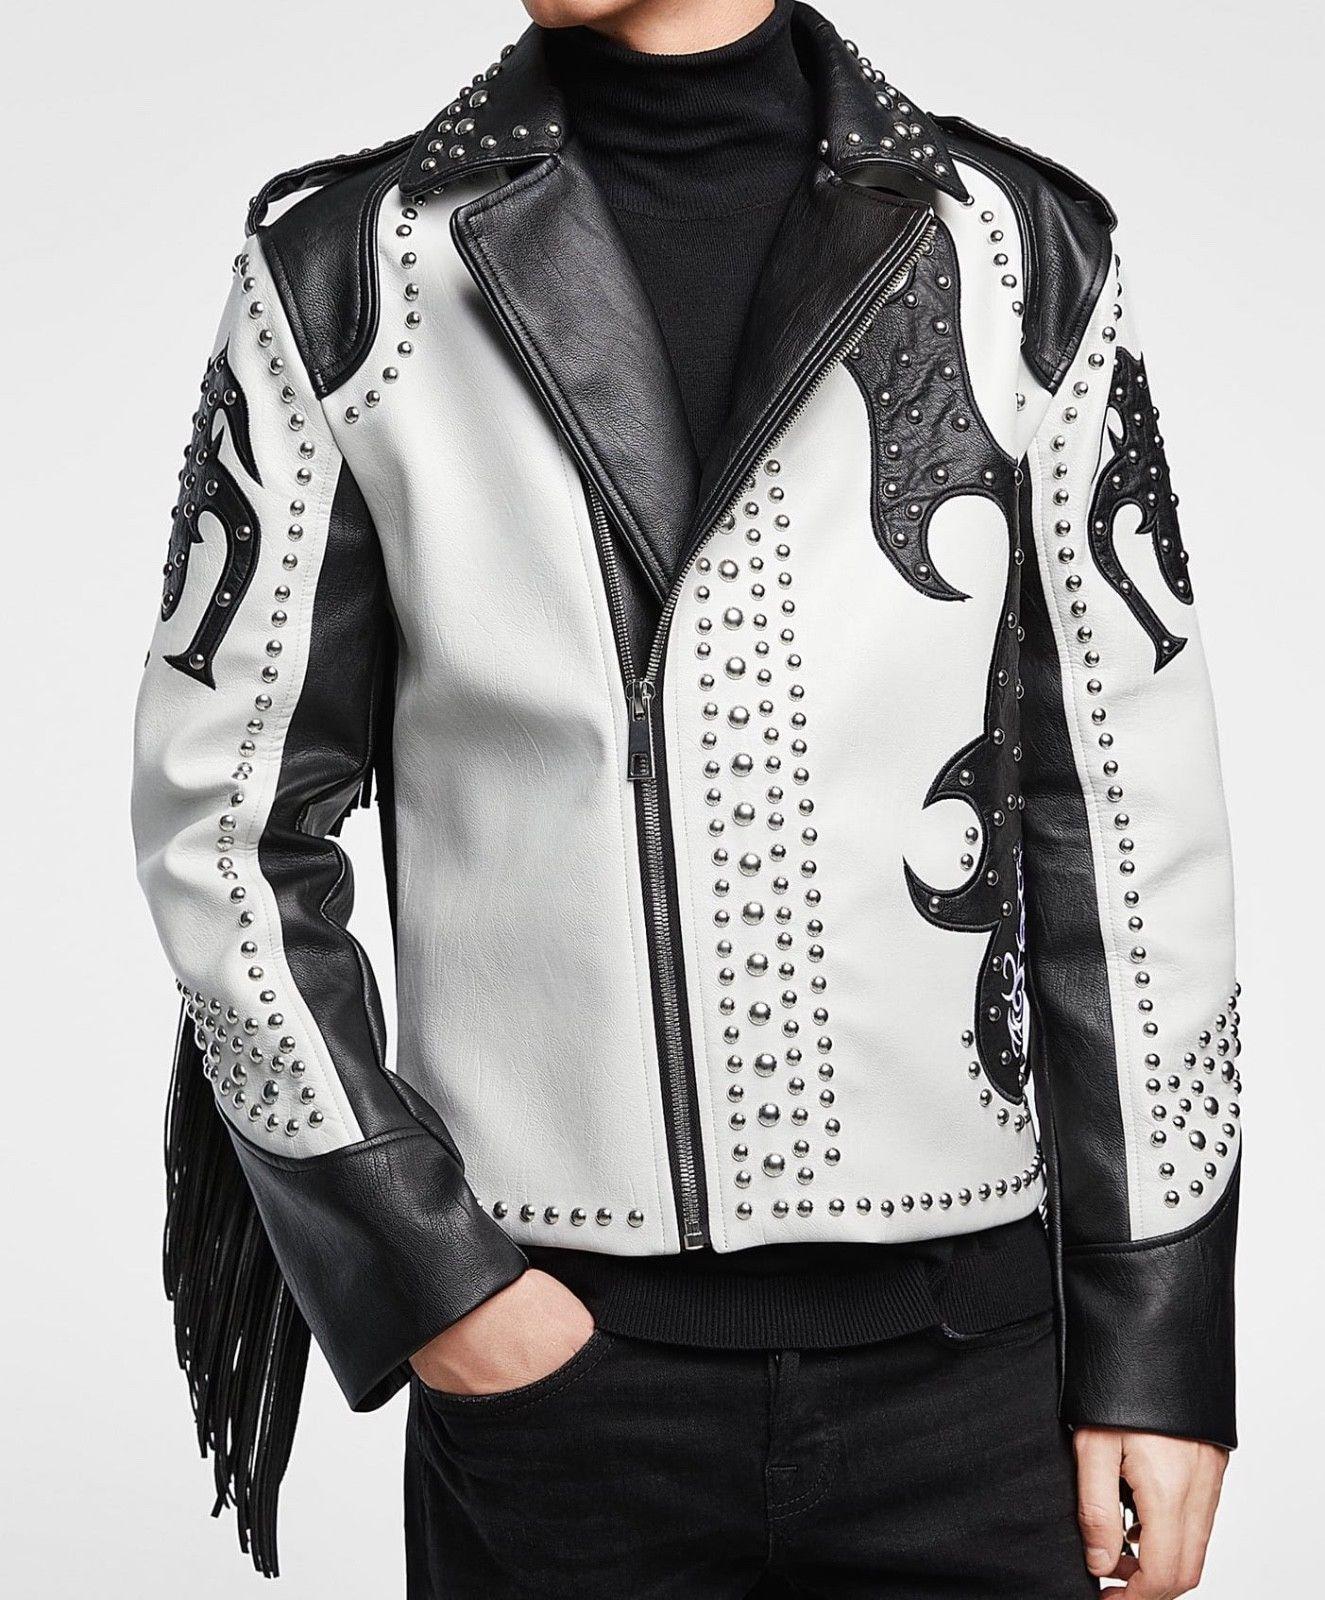 Leather Skin Men Women Unisex White Belted Genuine Leather